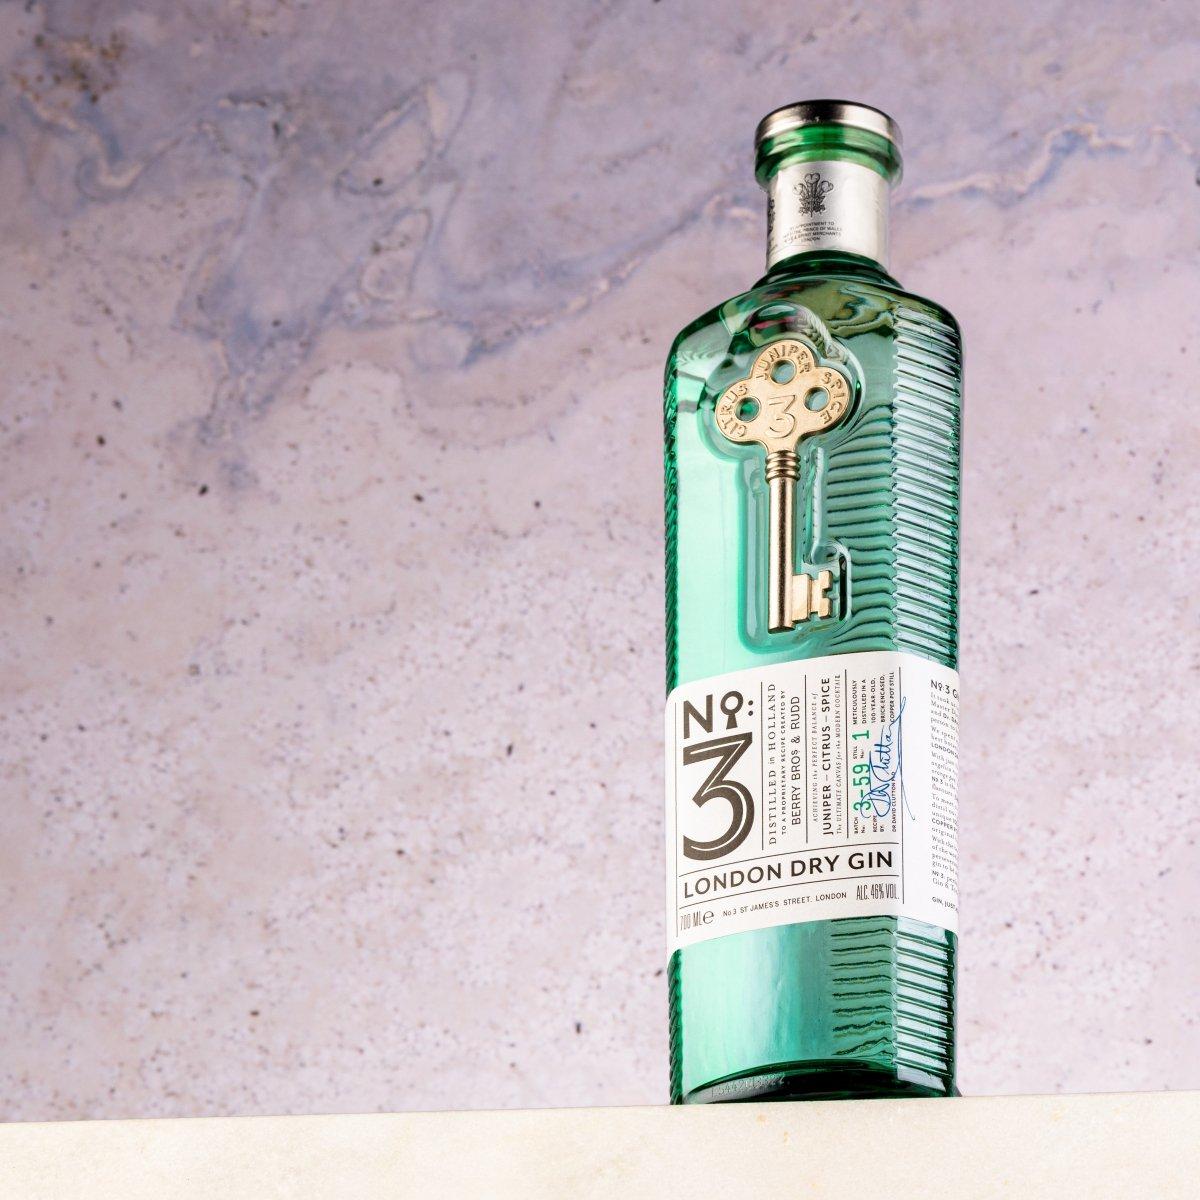 N3 London Dry Gin